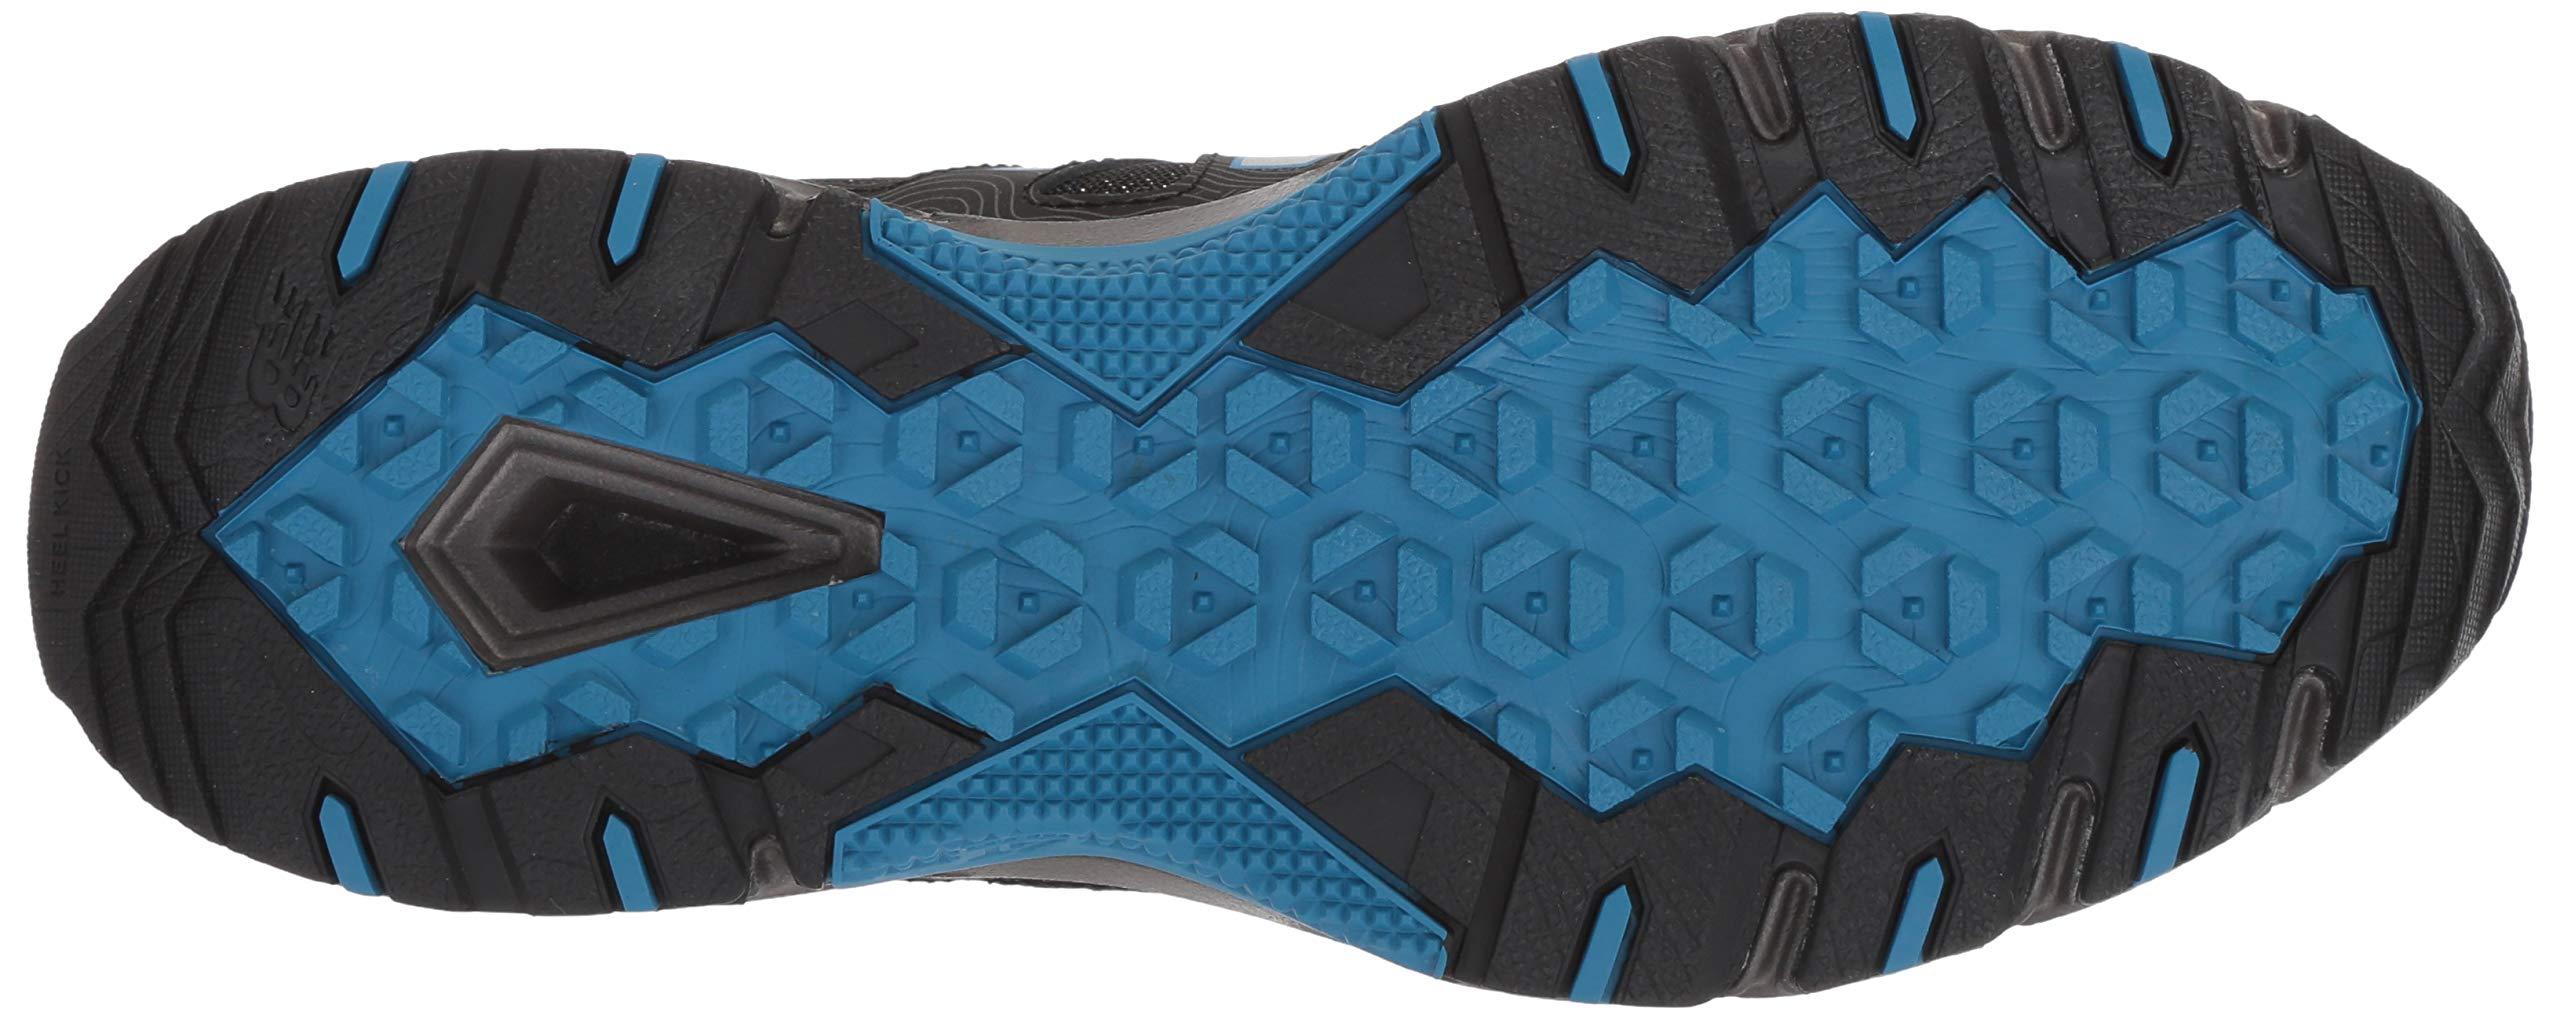 New Balance Men's 510v4 Cushioning Trail Running Shoe, Magnet/Black/Reflective, 7.5 D US by New Balance (Image #3)